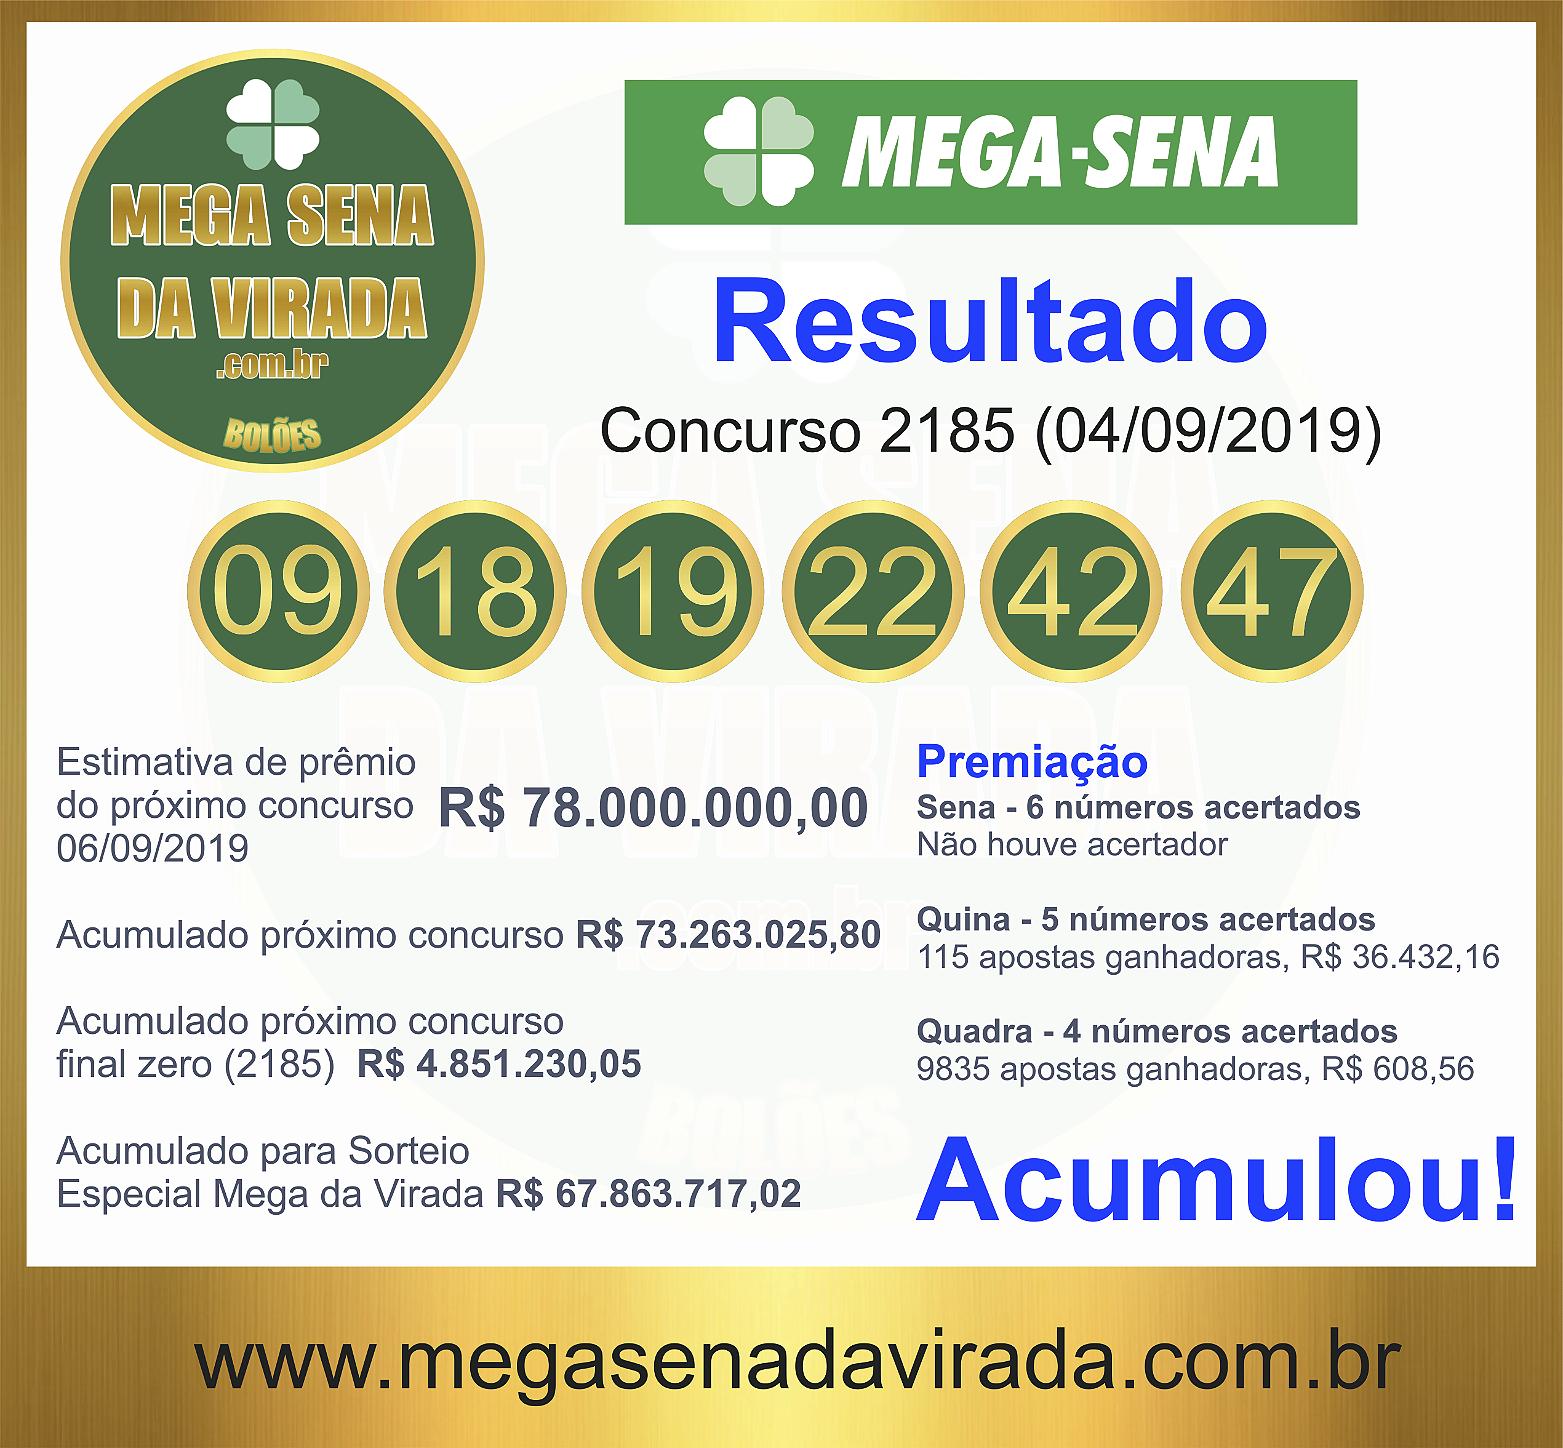 Mega Sena Concurso 2185 04/09/2019